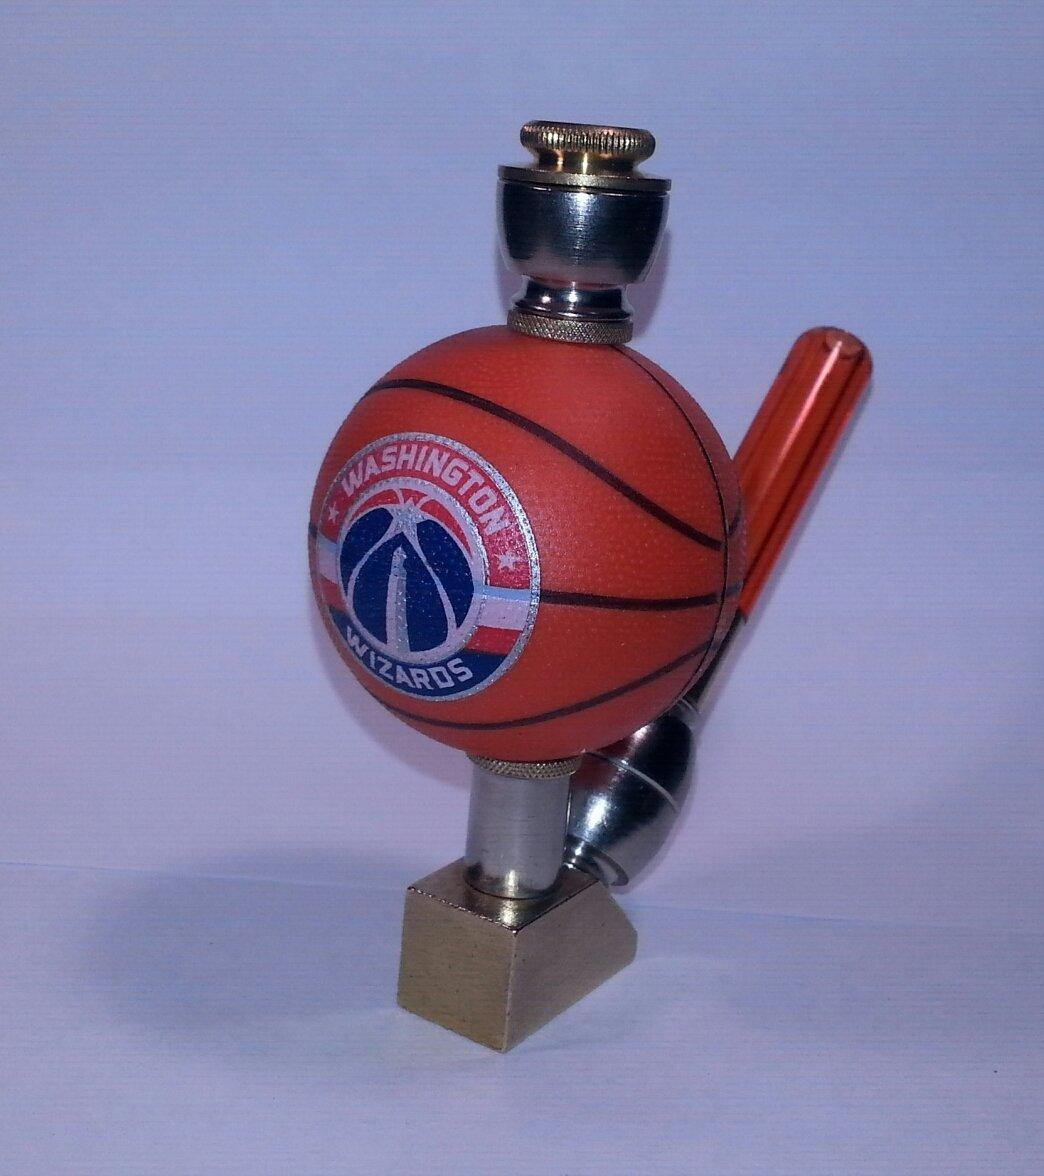 Washington Wizards  NBA Basketball Pipe Wedge Design Nickel/Brass Finish